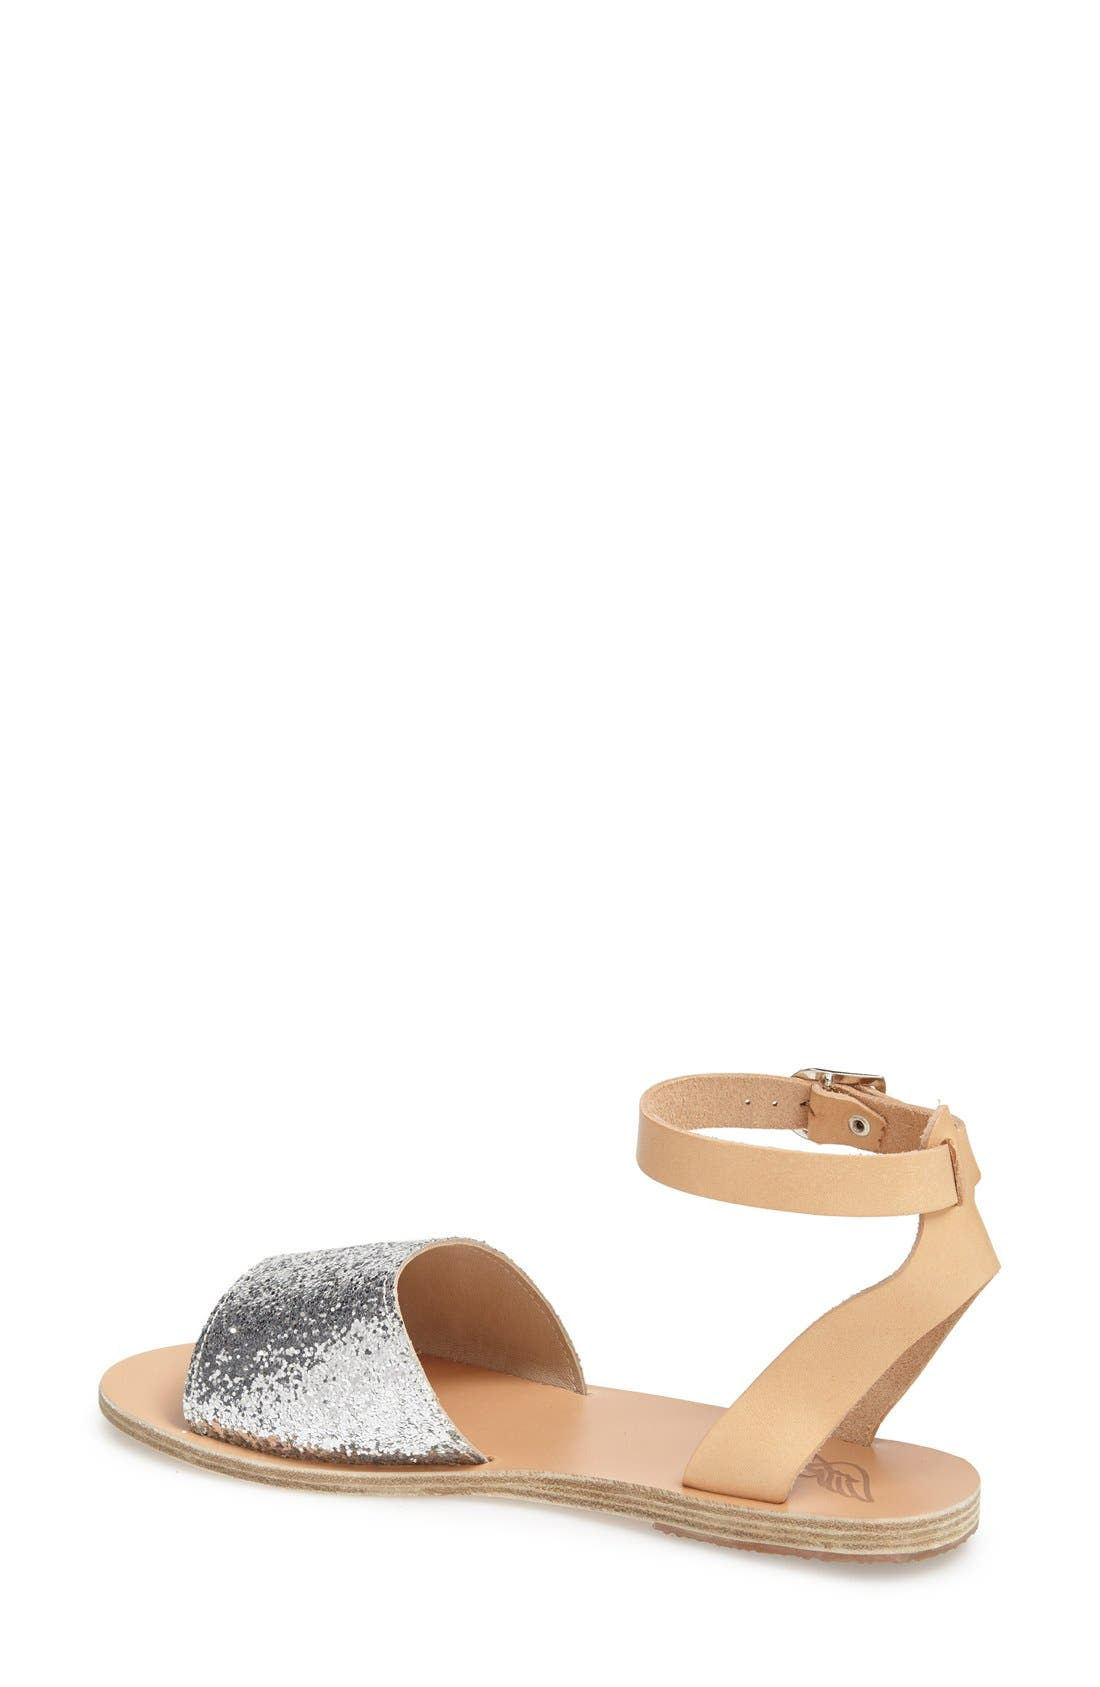 Alternate Image 2  - Ancient Greek Sandals 'Thalpori' Leather Ankle Strap Sandal (Women)